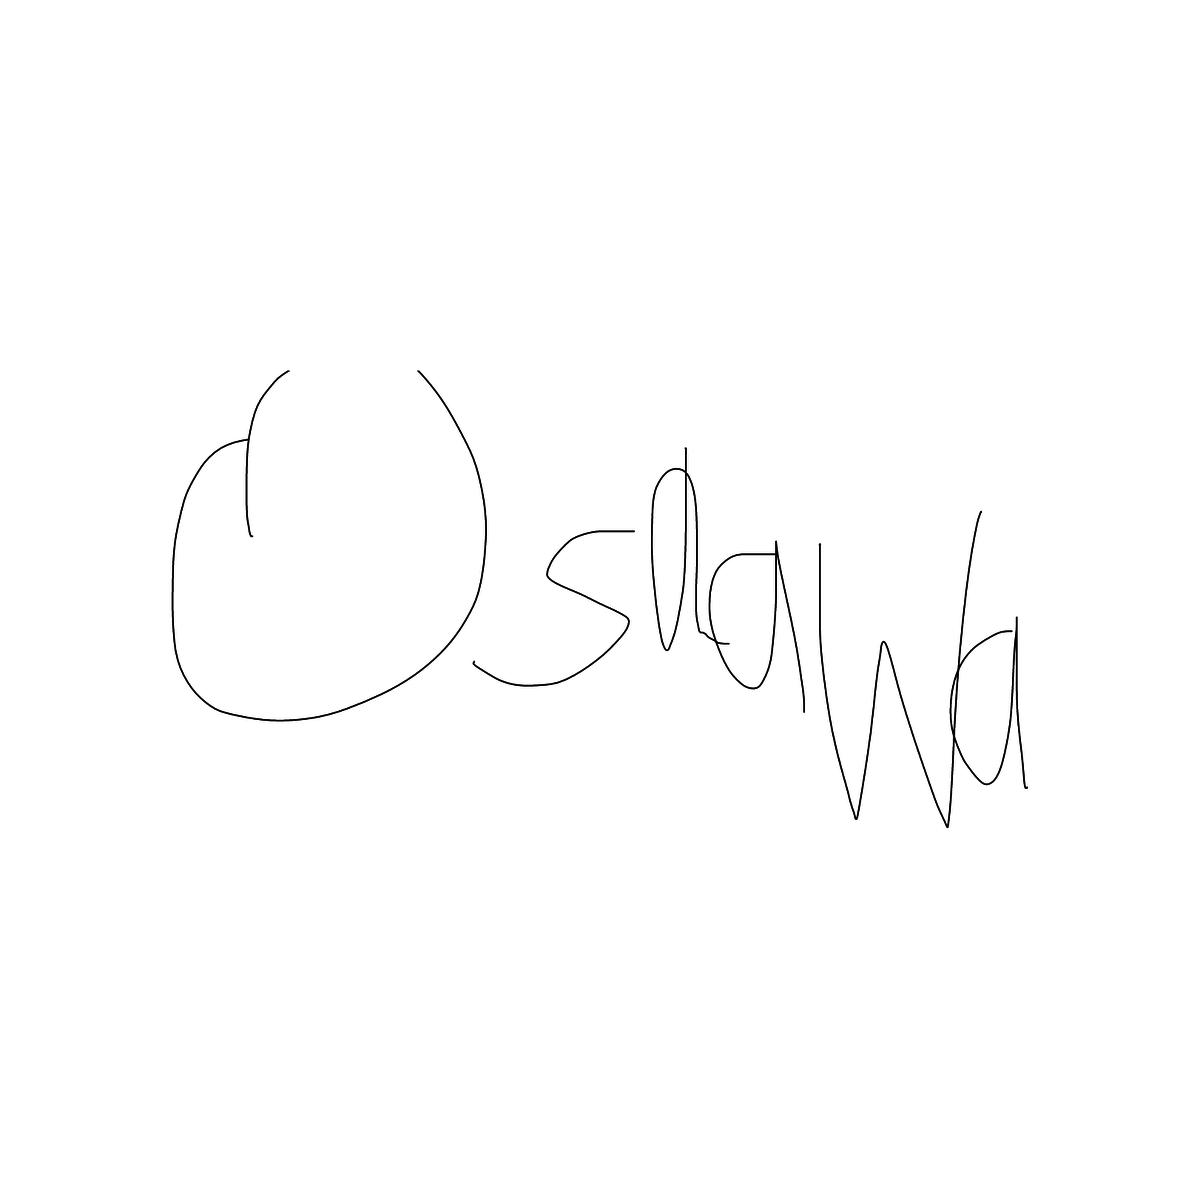 BAAAM drawing#14940 lat:50.7503585815429700lng: -86.8798828125000000